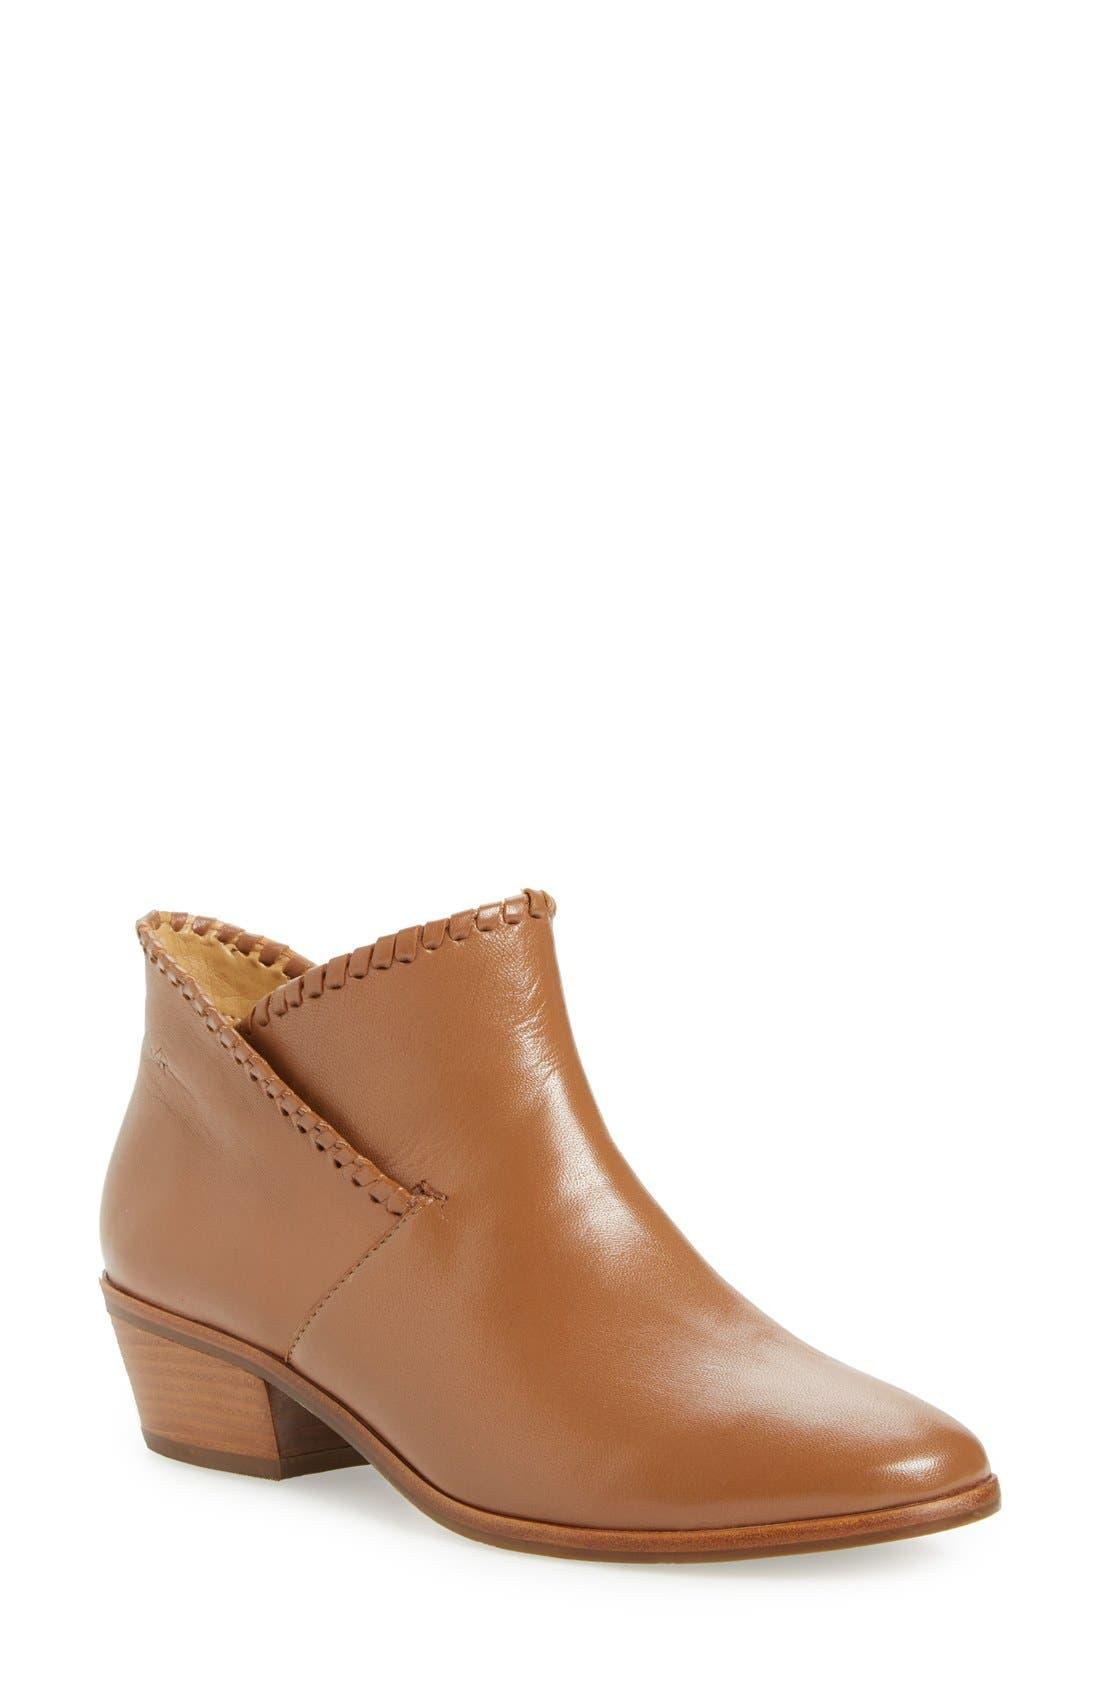 'Sadie' Bootie,                         Main,                         color, Oak Leather